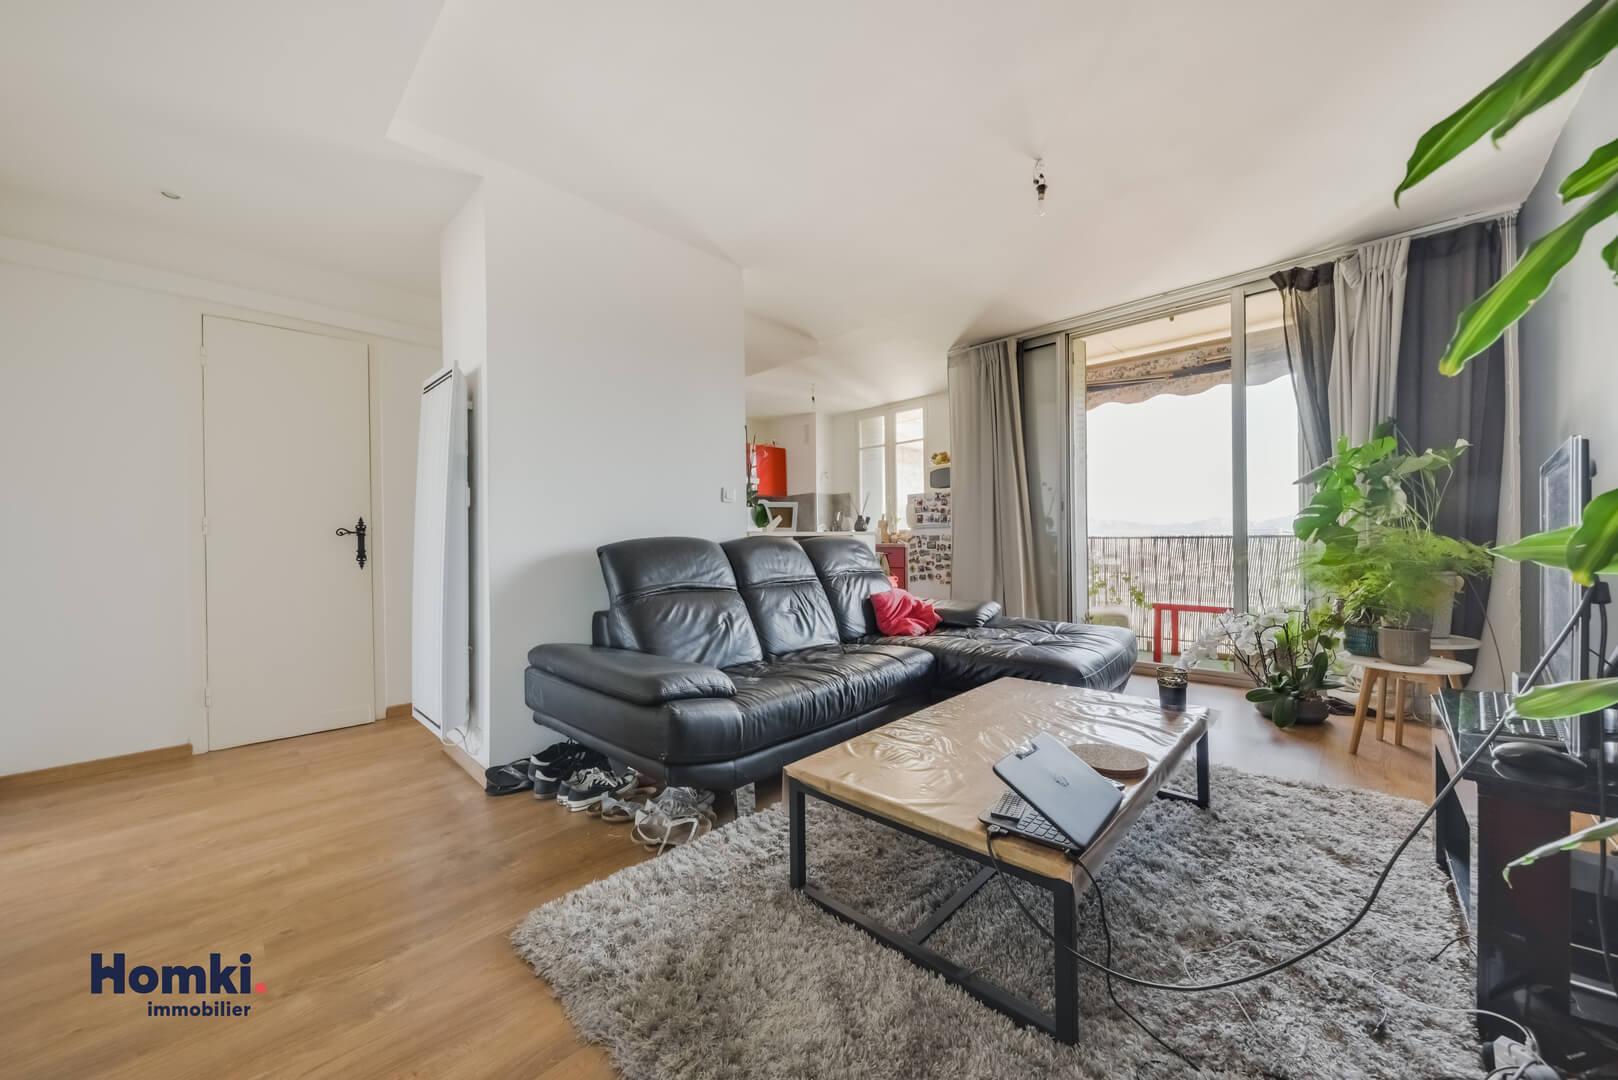 Vente appartement Marseille T3 13006 Castellane Prado_4